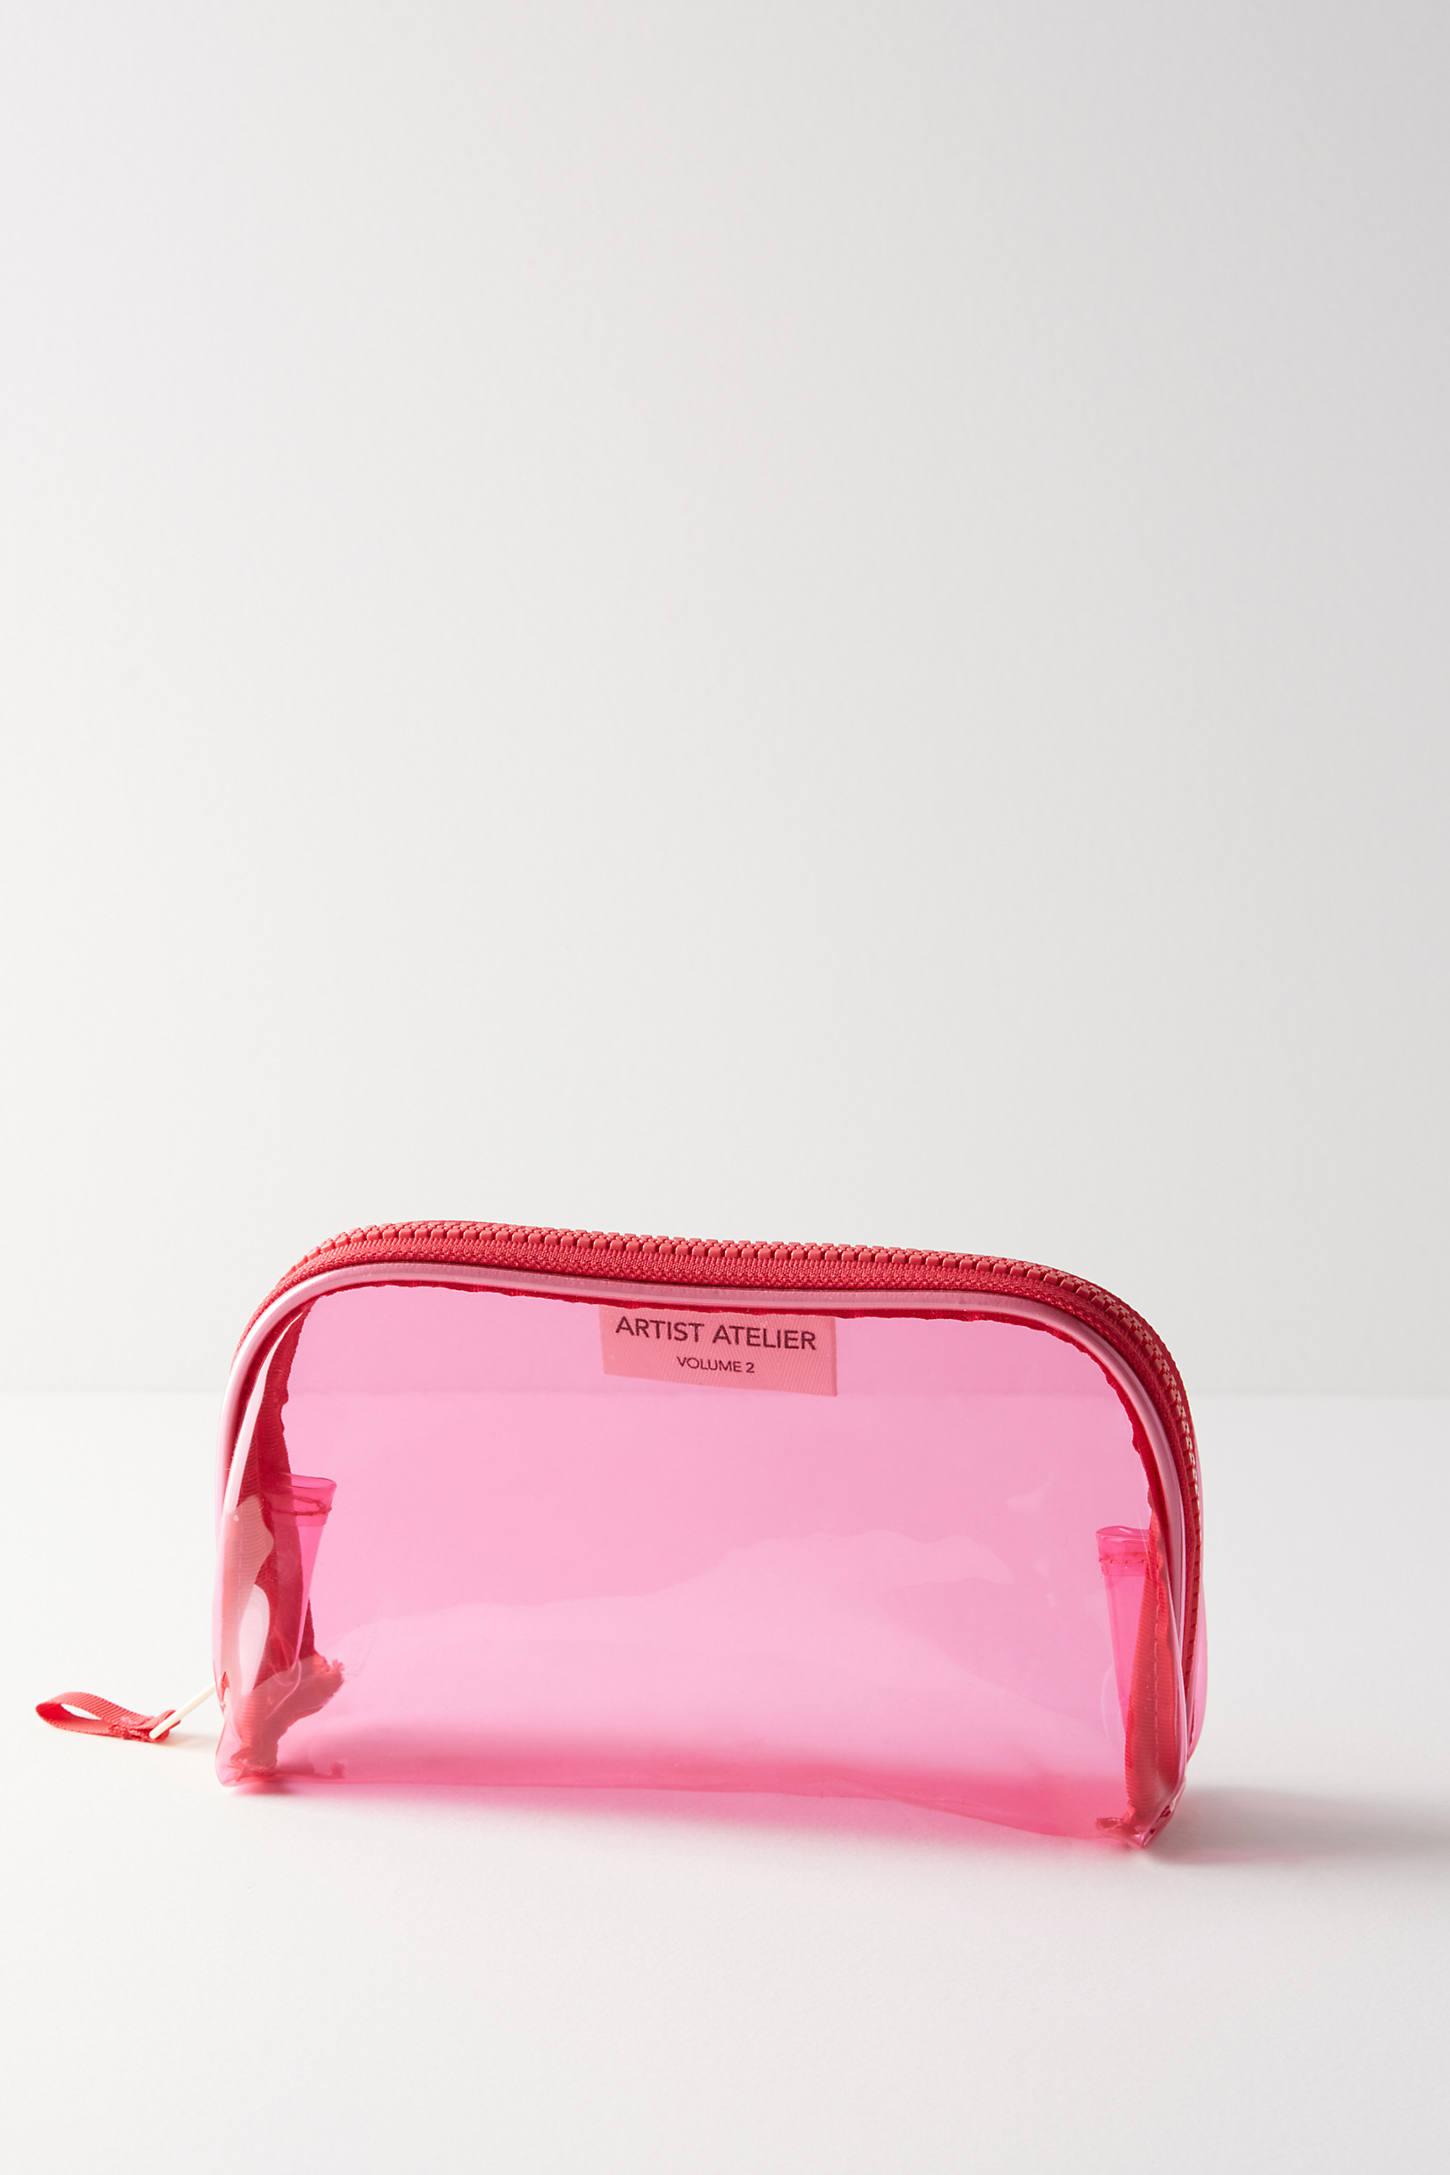 Artist Atelier Makeup Bag